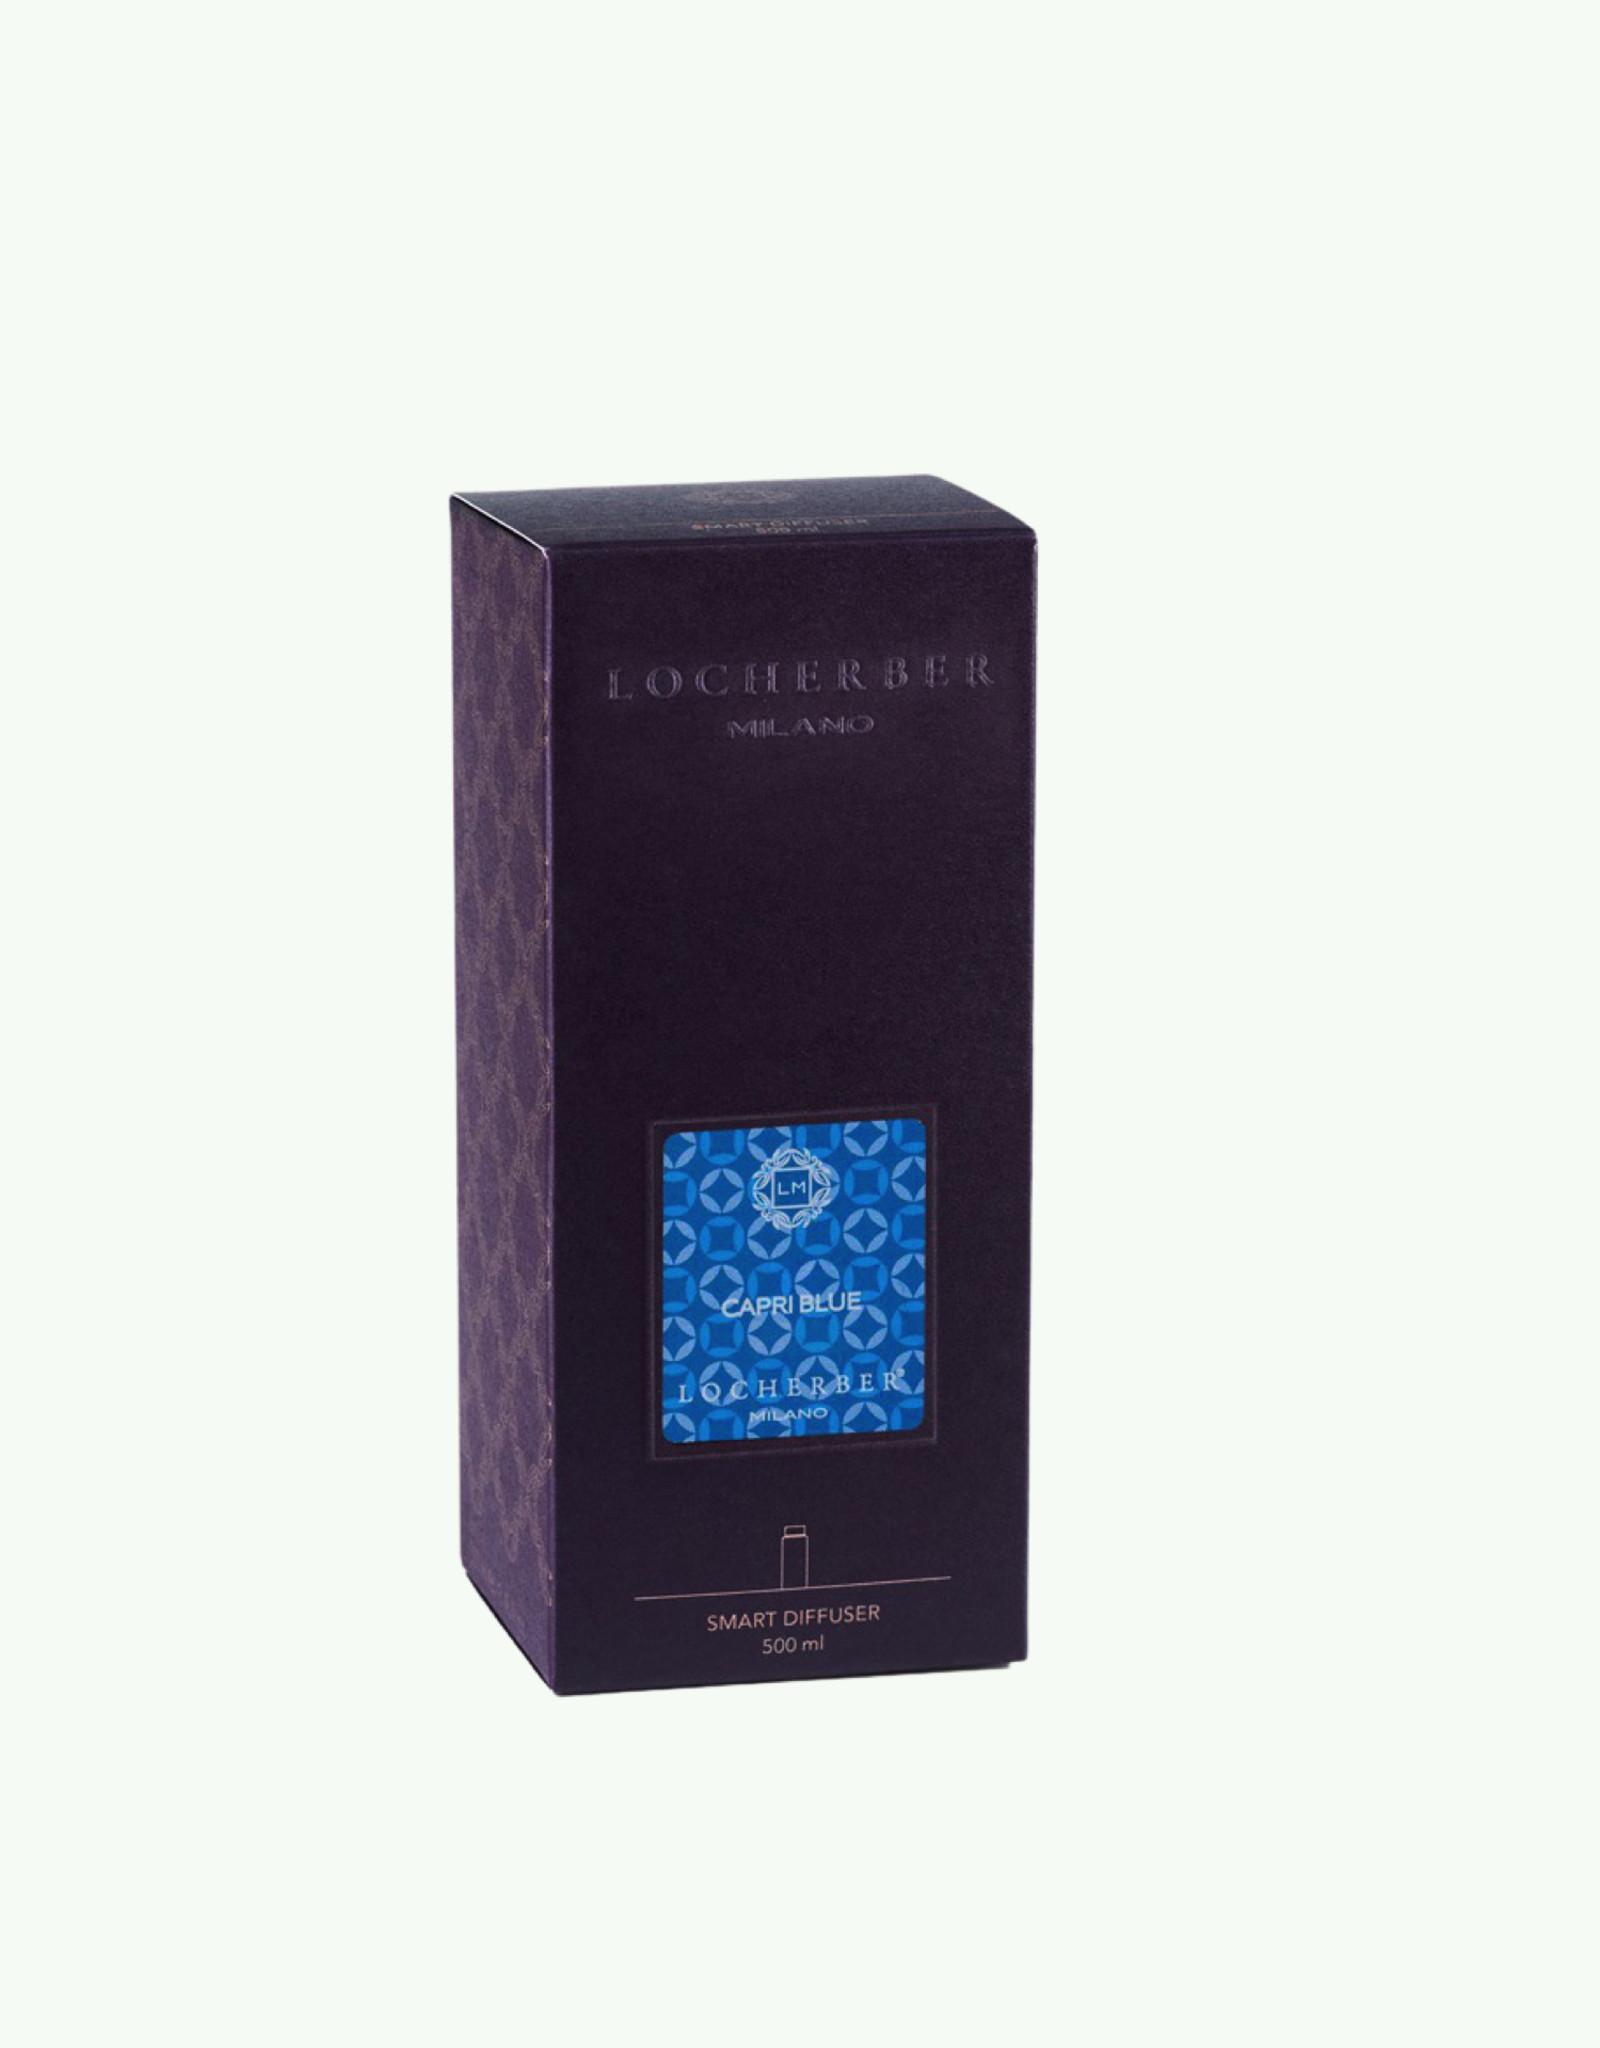 Locherber Locherber - Capri Blue - Bouteille de recharge 500 ml